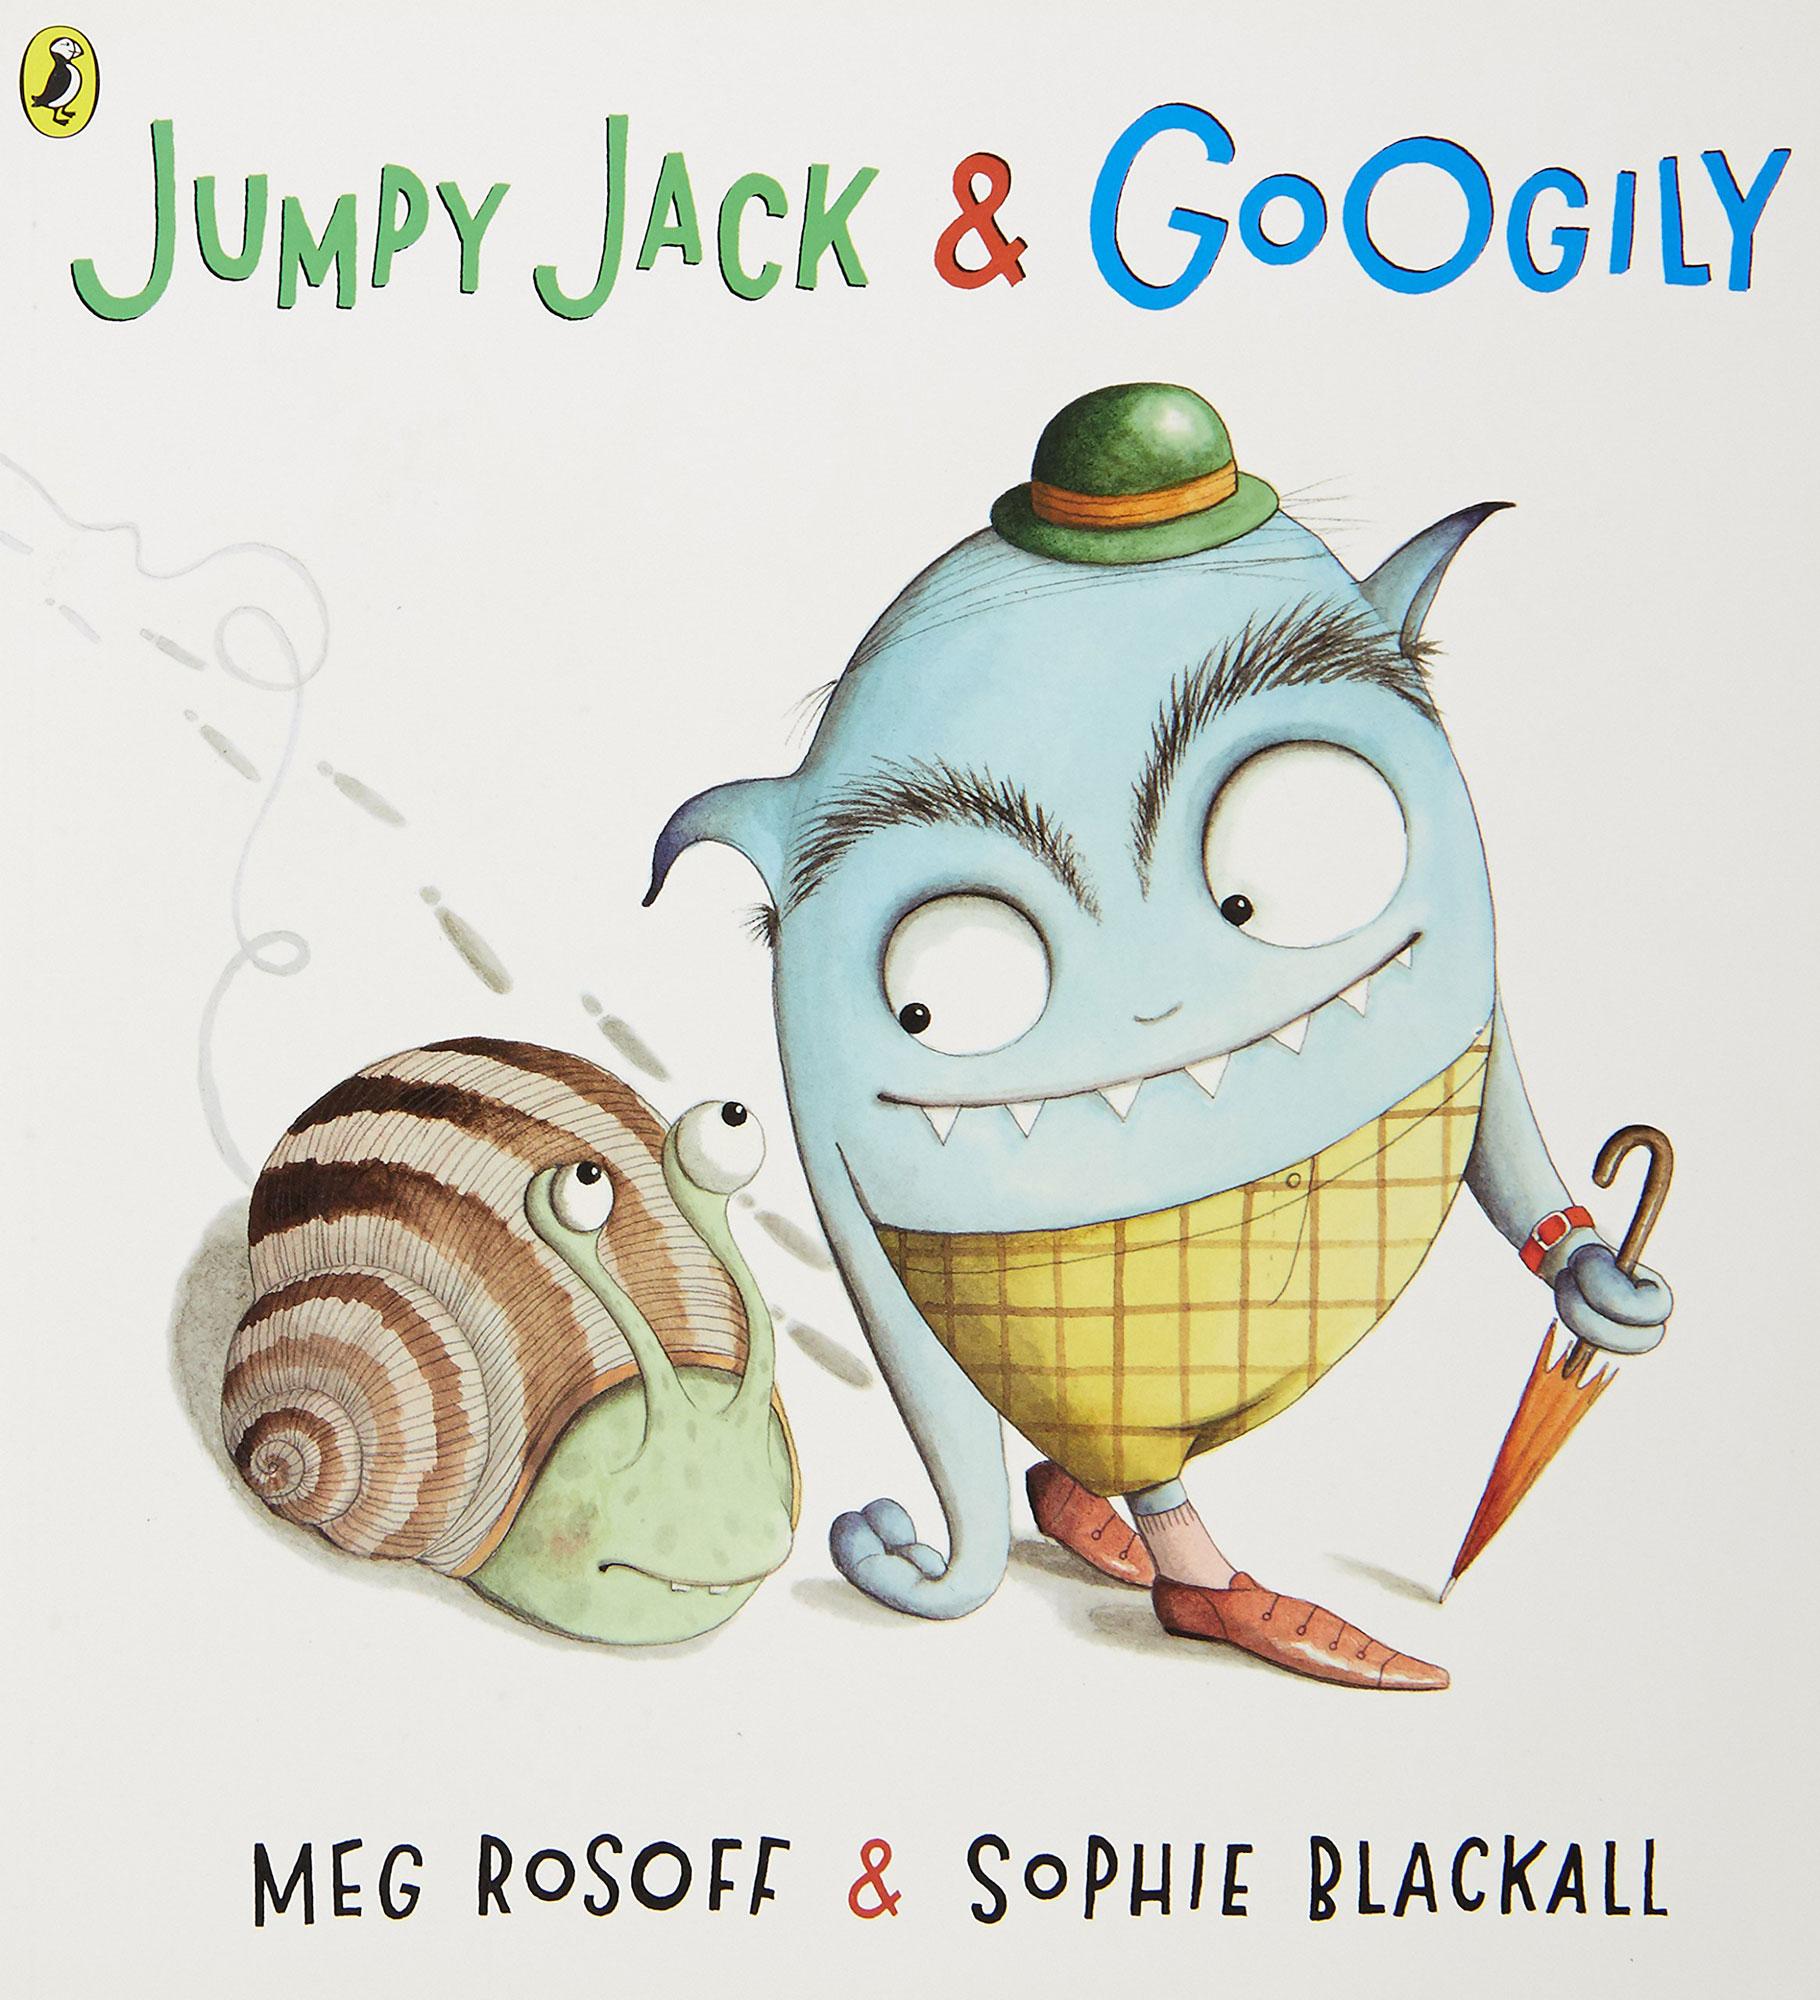 Meg-Rosoff-&-Sophie-Blackall---Jumpy-Jack-&-Googily.jpg